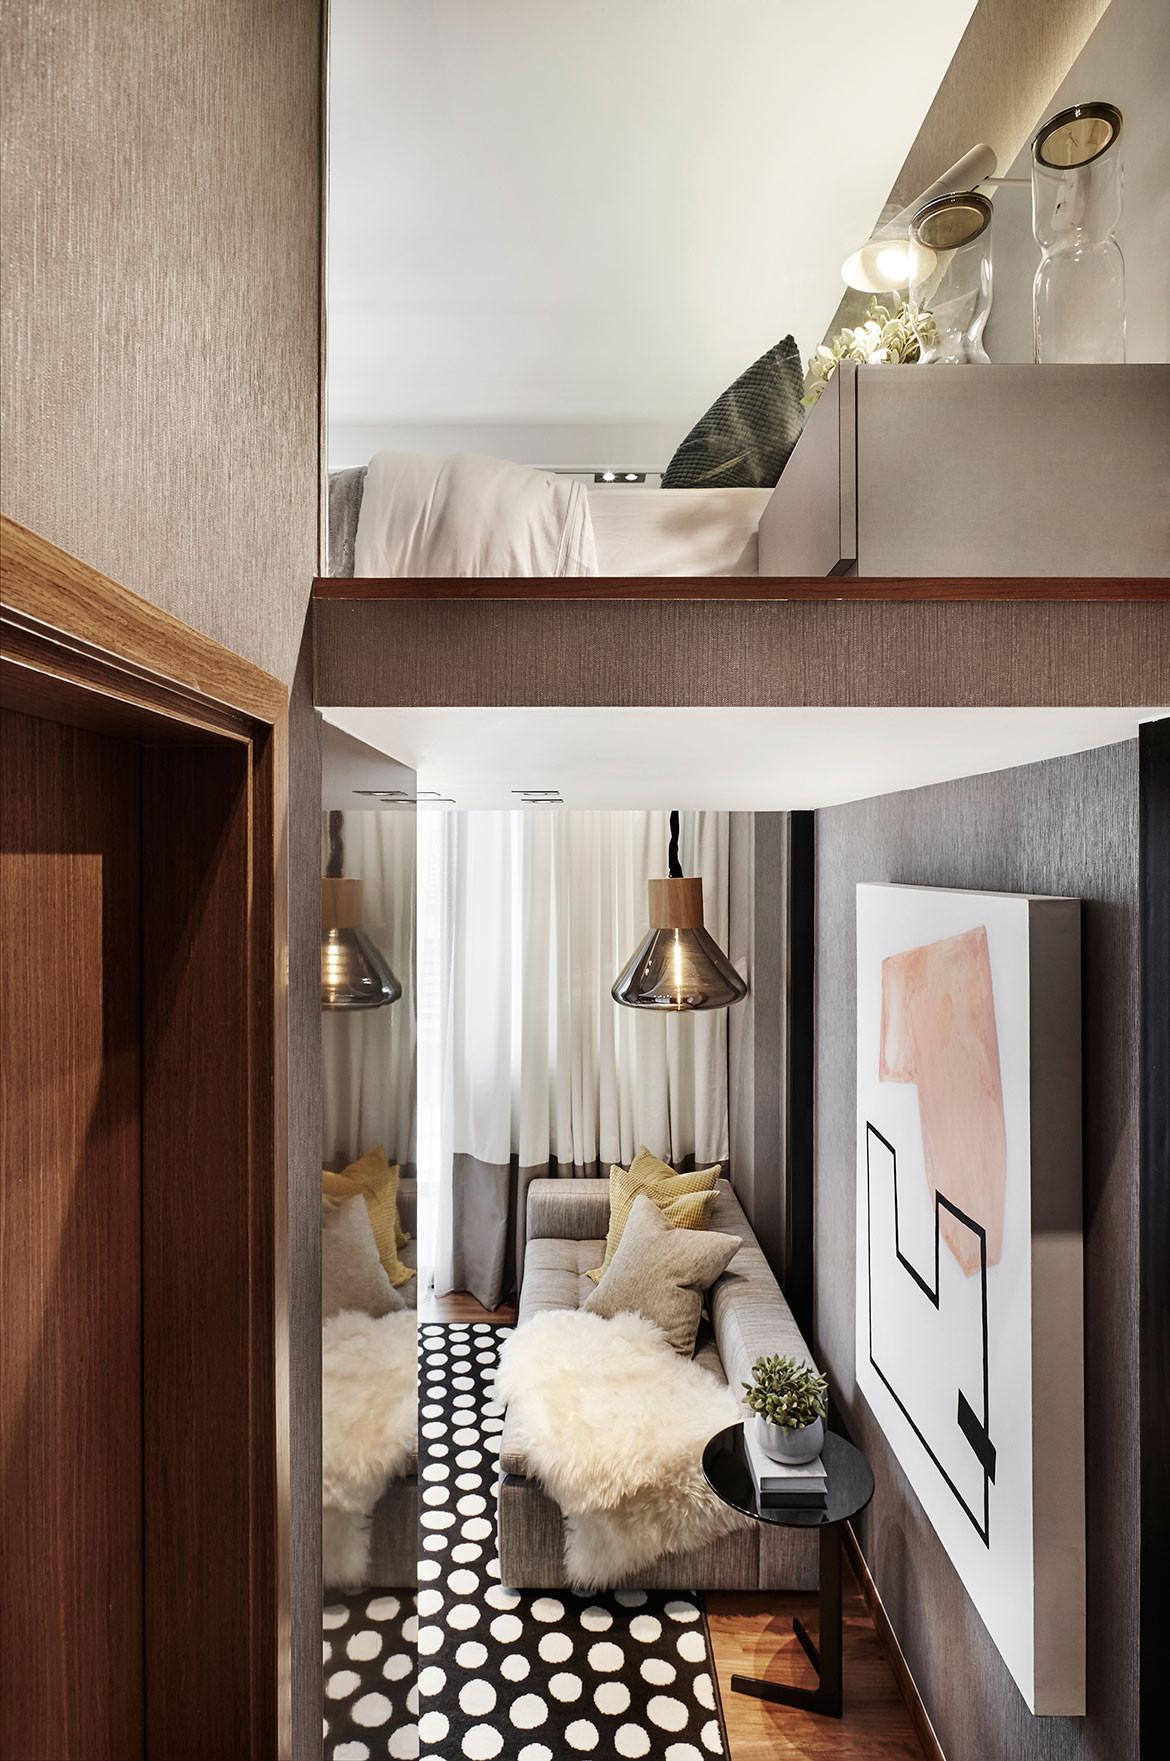 4 Great Loft Ideas Lookbox Living duay key apartment levels